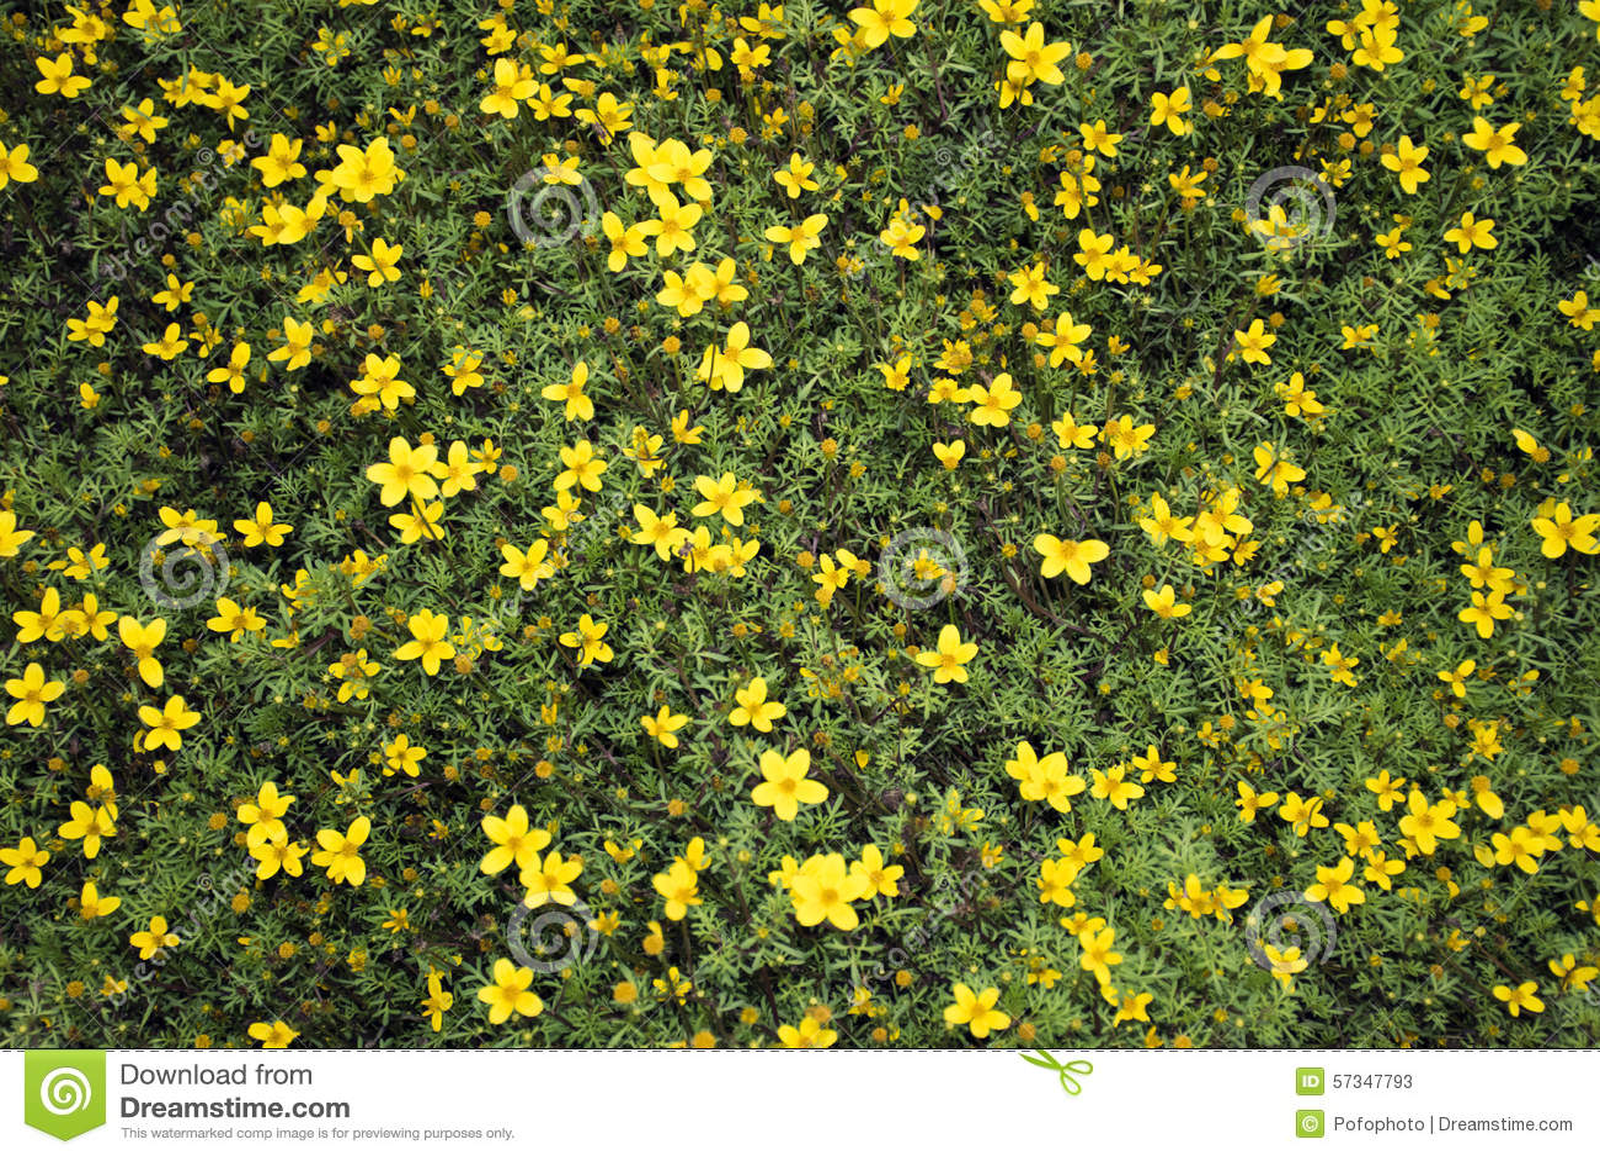 Small yellow flowers bidens ferulifolia stock image image of small yellow flowers bidens ferulifolia mightylinksfo